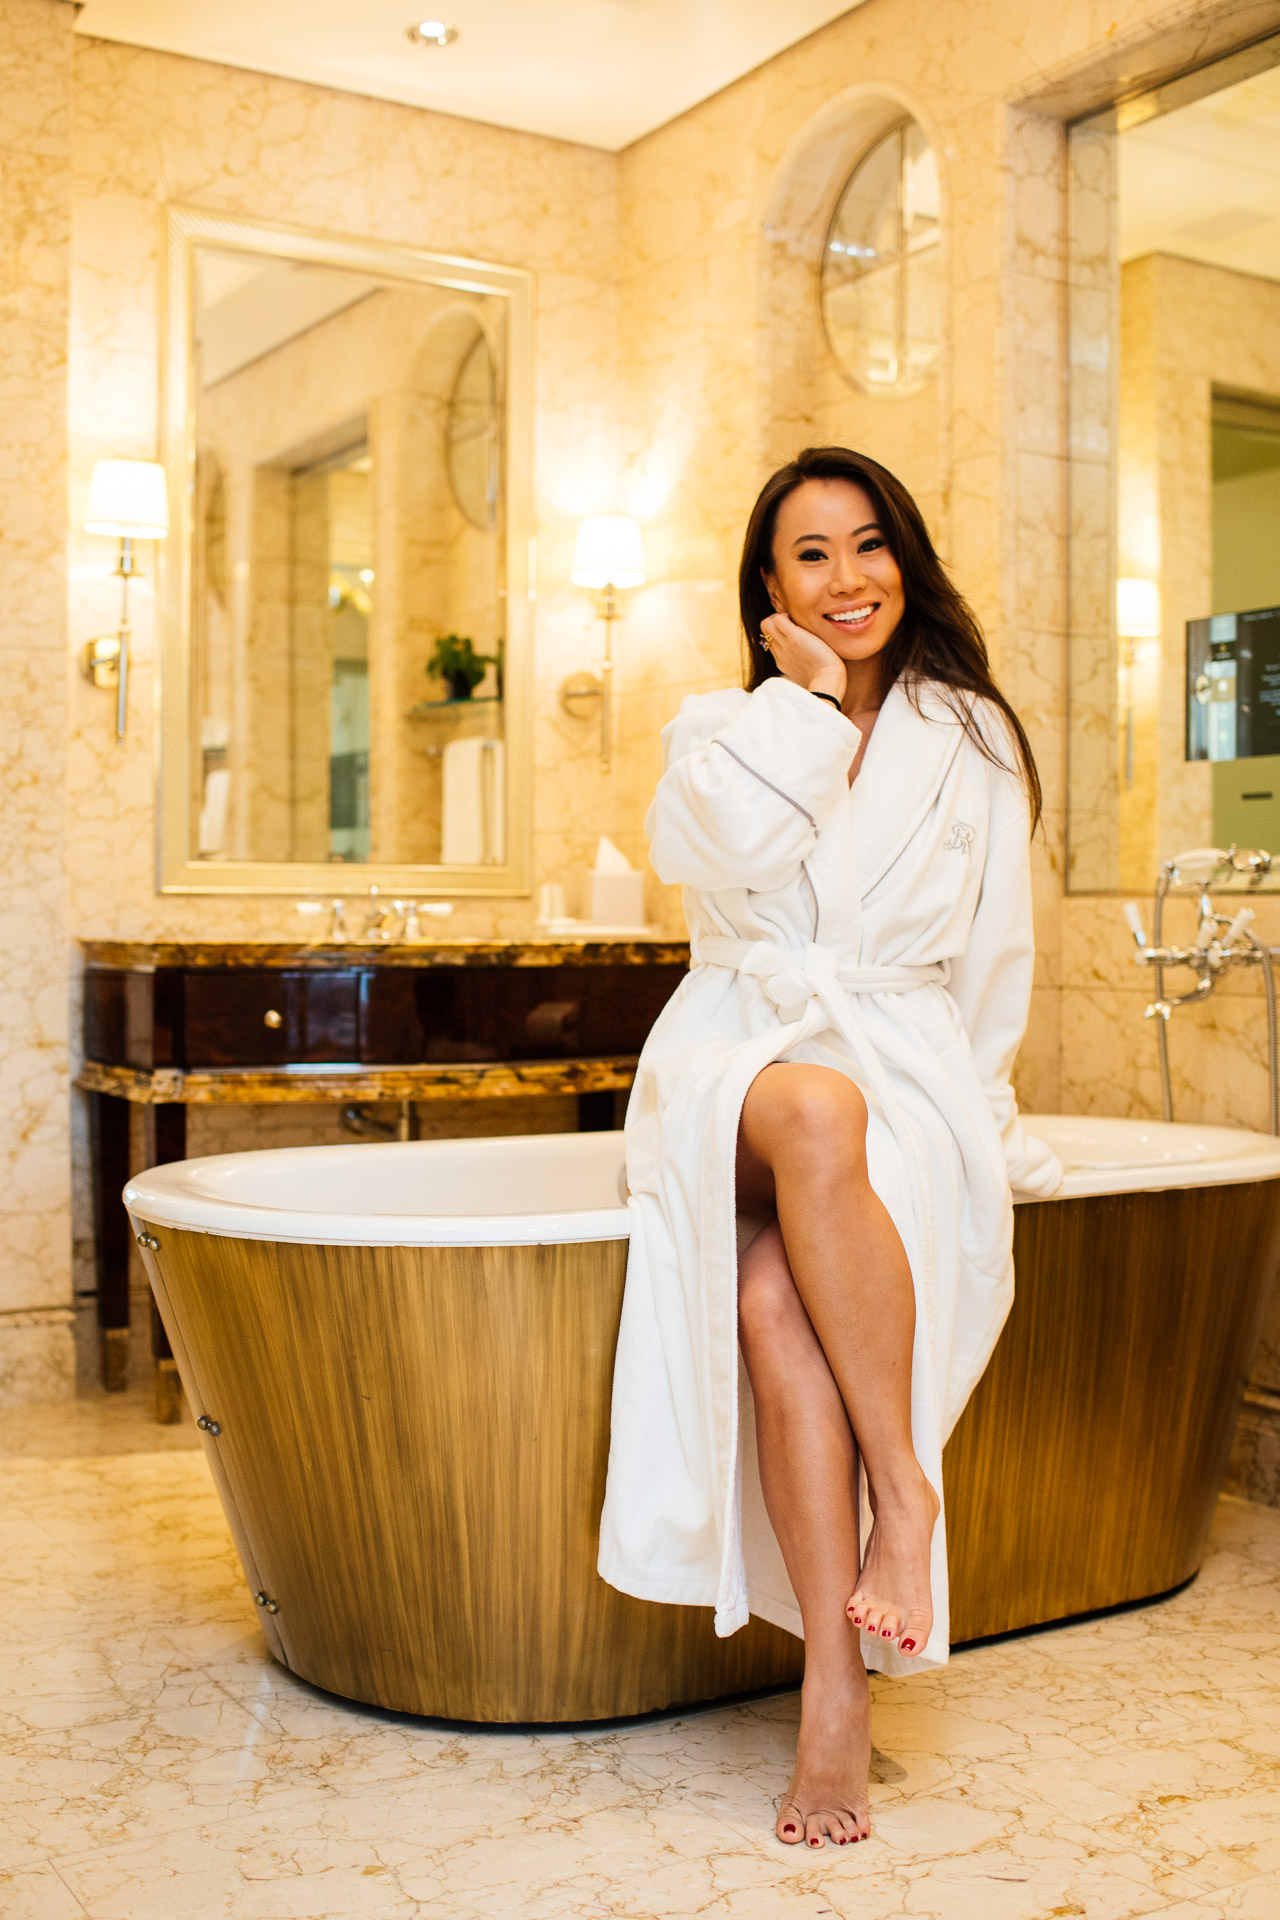 st-regis-singapore-marriott-luxury-hotel-photographer-8.jpg